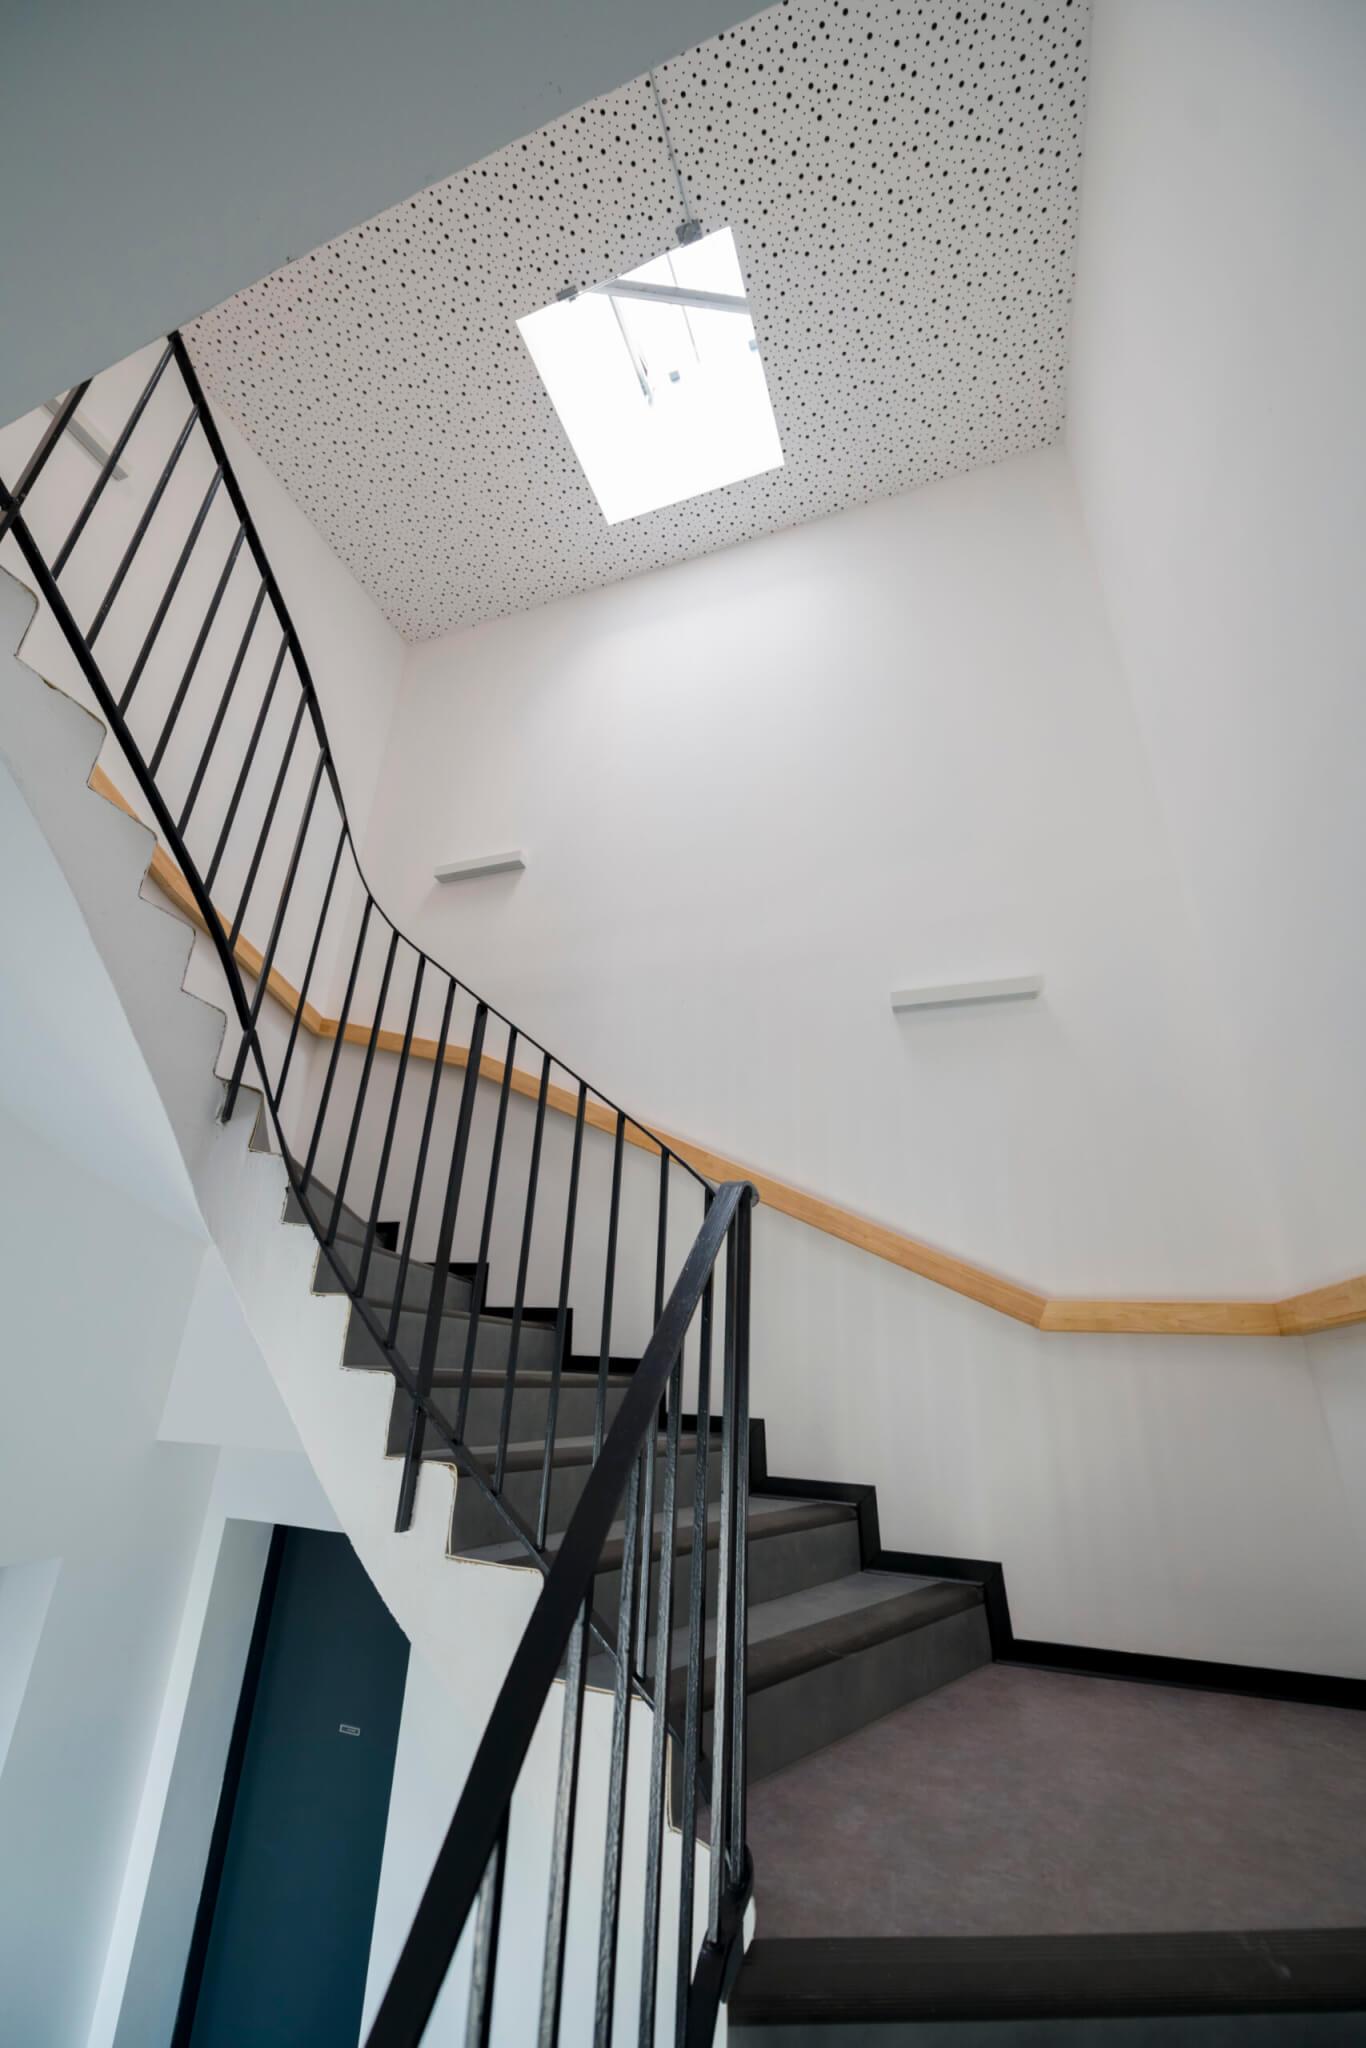 AAP_Logiest Pompey_vue escalier commun fini